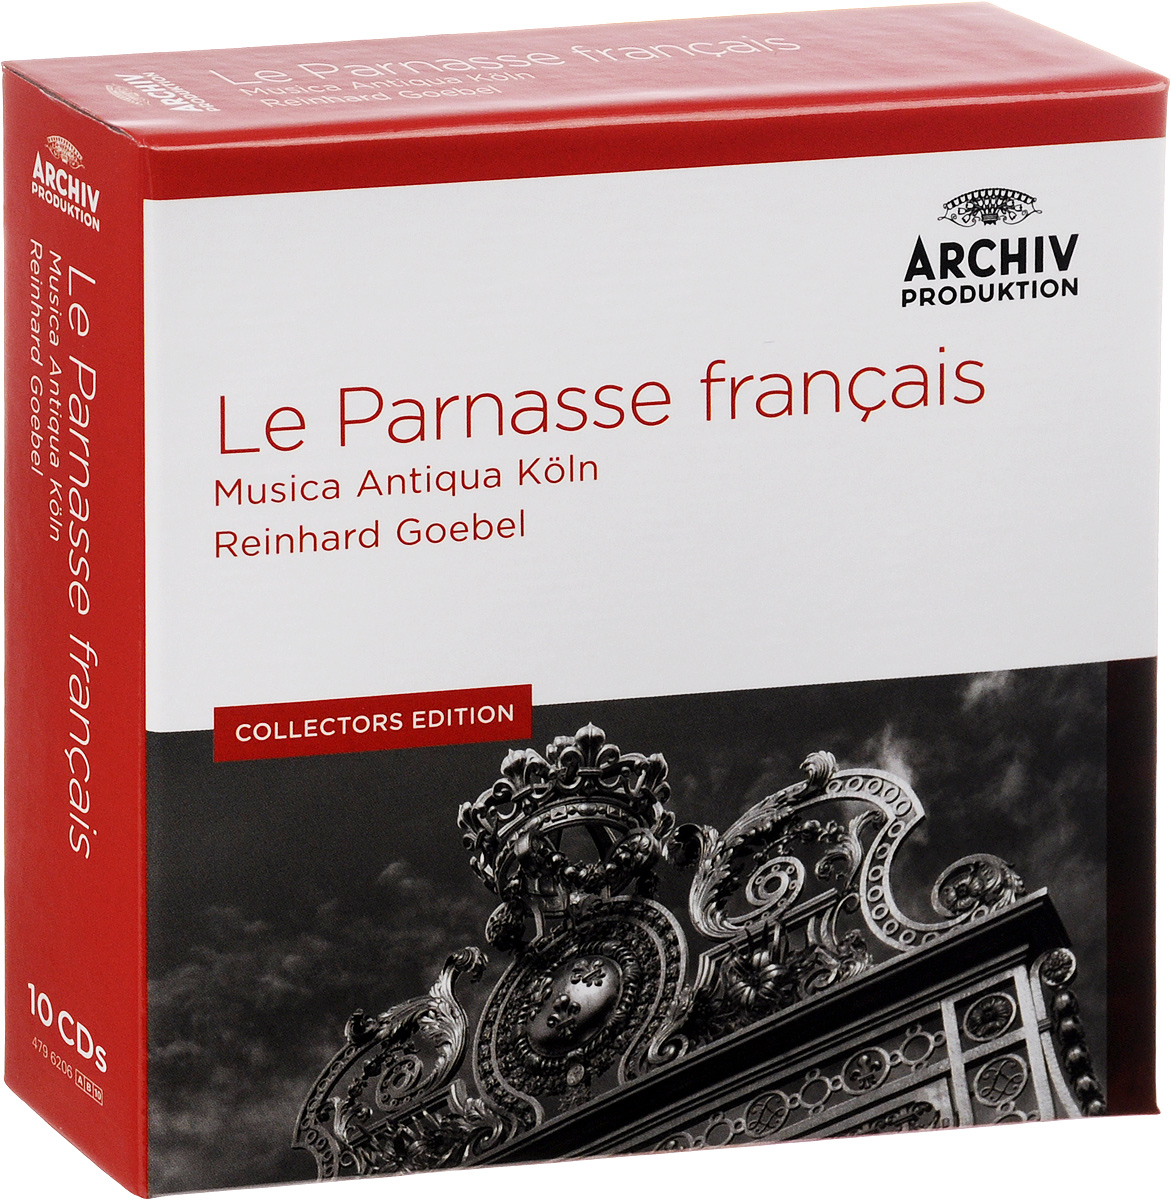 Рейнхард Гебель,Musica Antiqua Koln Orchestra Reinhard Goebel, Musica Antiqua Koln. Le Parnasse Francais. Collectors Edition (10 CD)